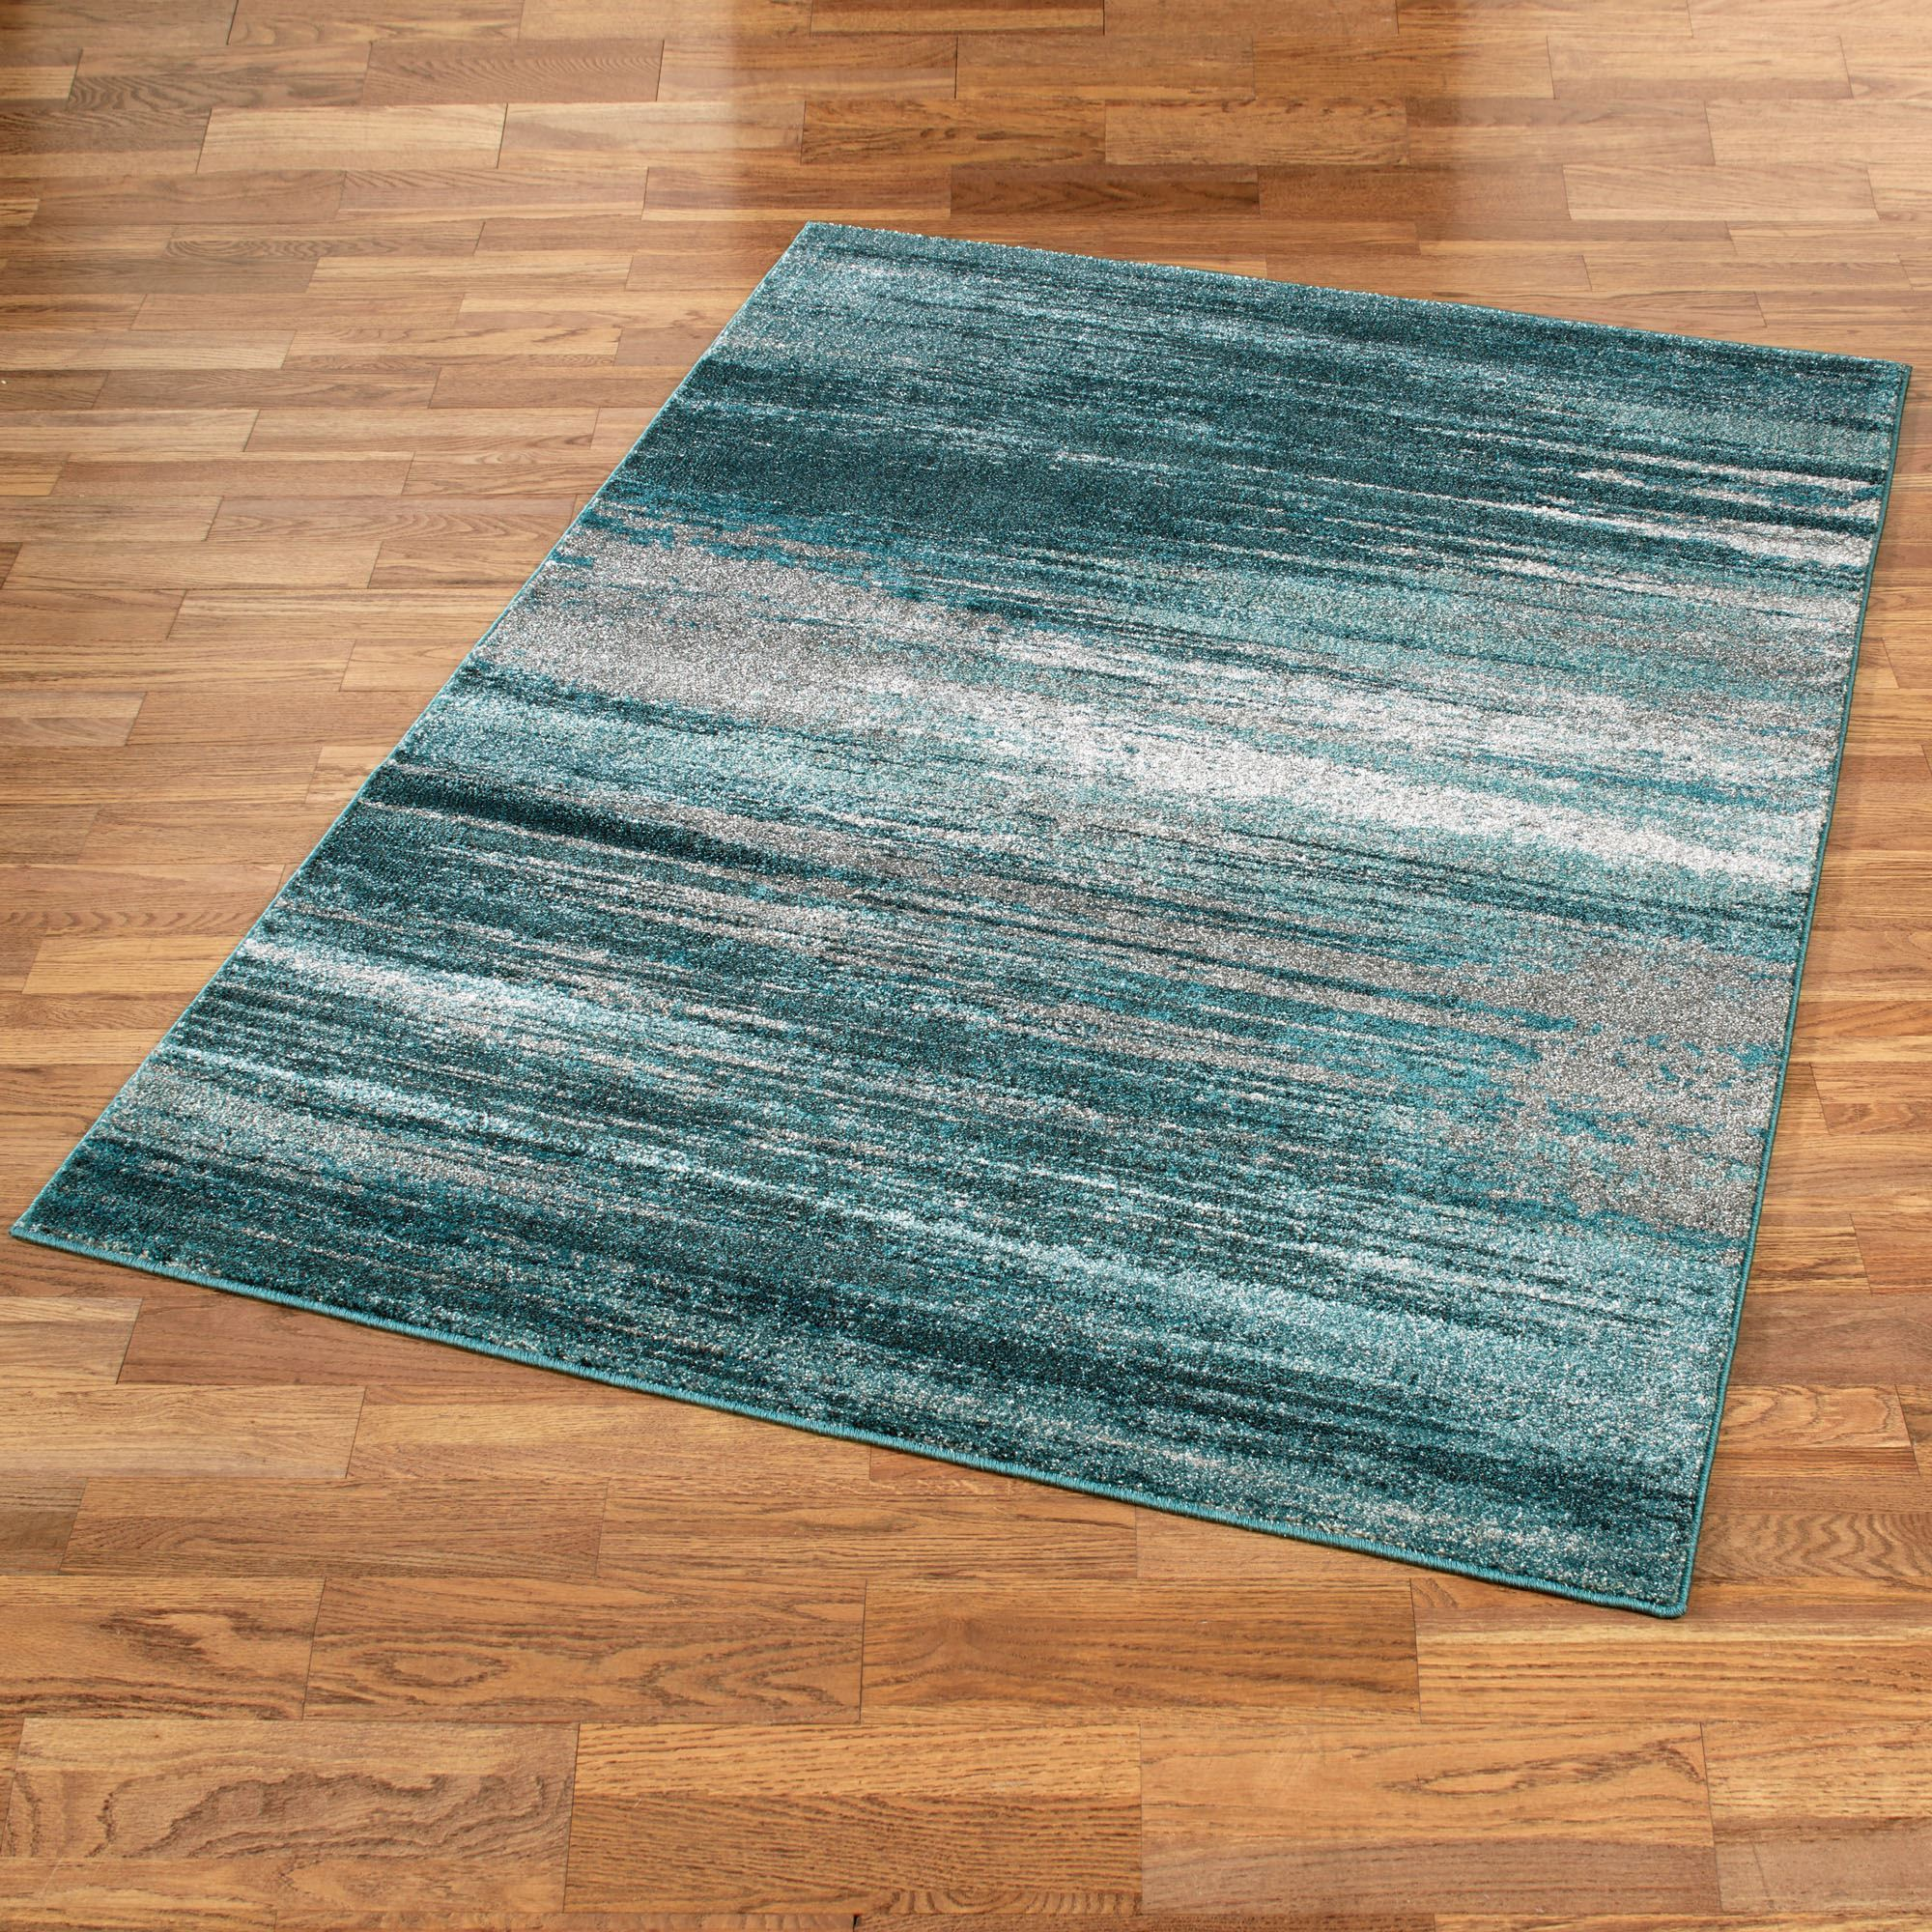 teal area rug stormy skies rectangle rug teal LRNJIAX